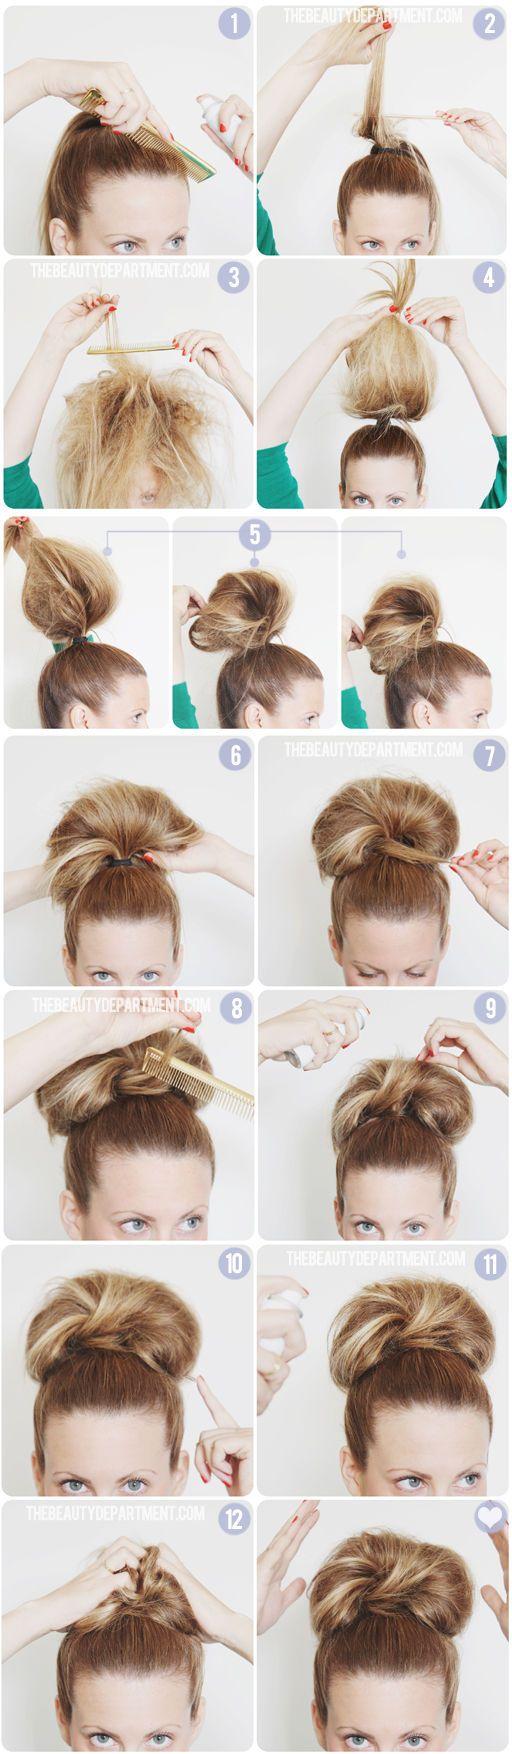 Transform a workaday big bun into a party look.